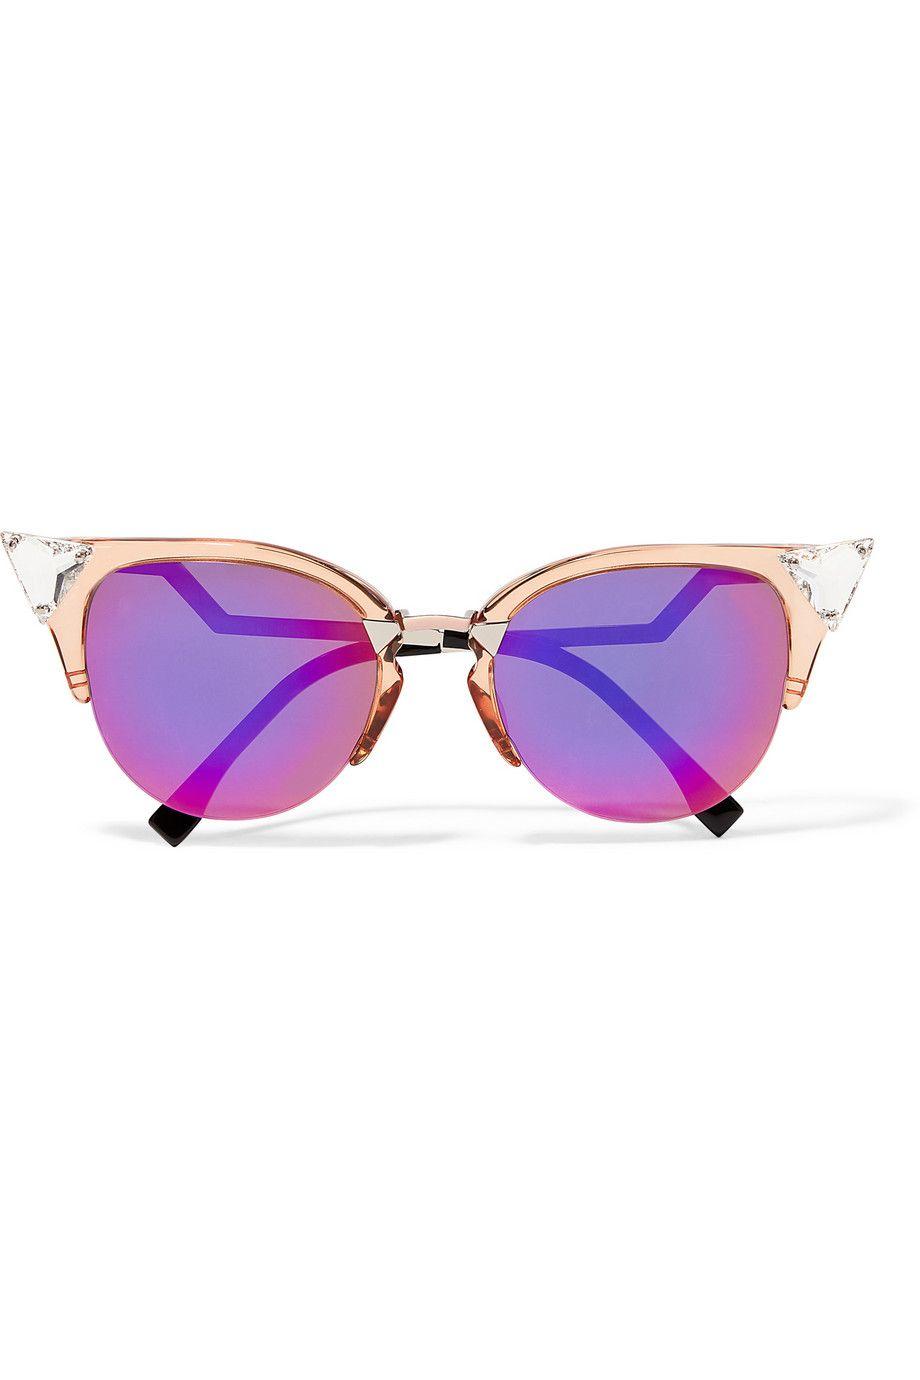 bf6f1f1a6cad FENDI Swarovski crystal-embellished cat-eye acetate and metal sunglasses